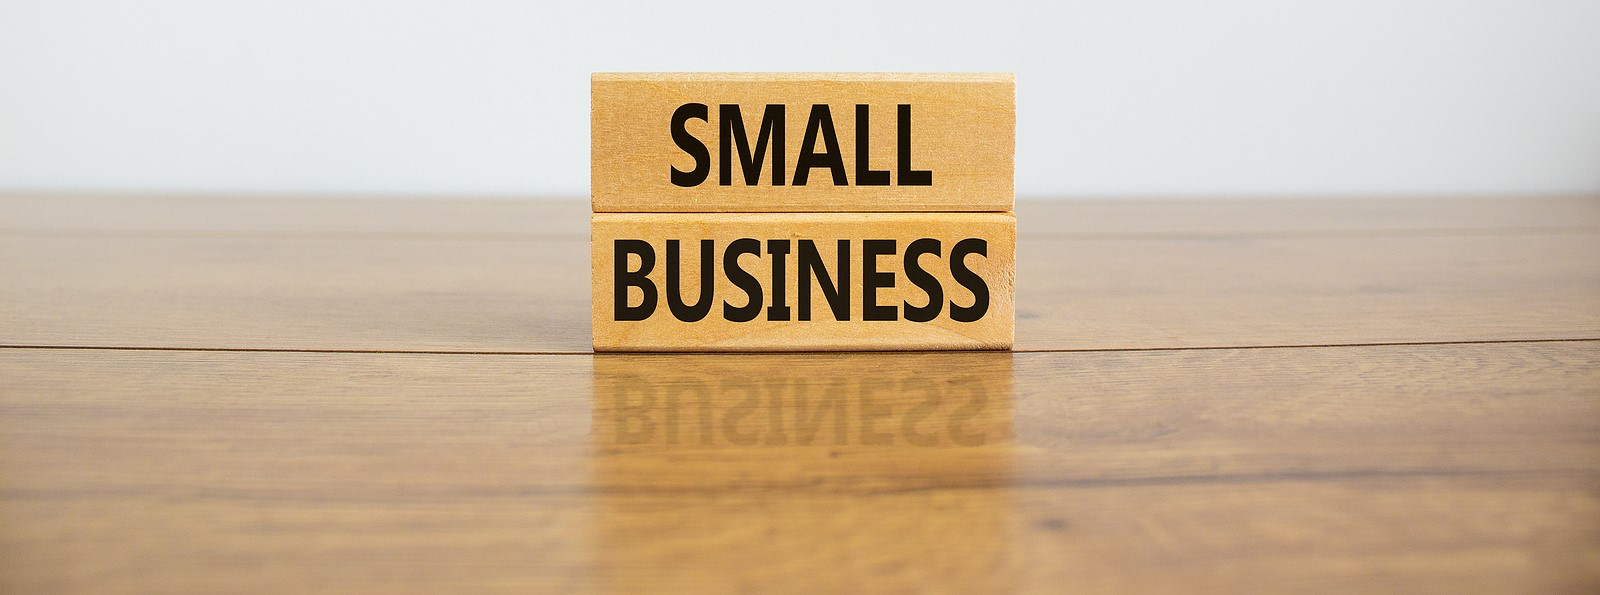 Bigstock Small Business Symbol Wooden 4037239281